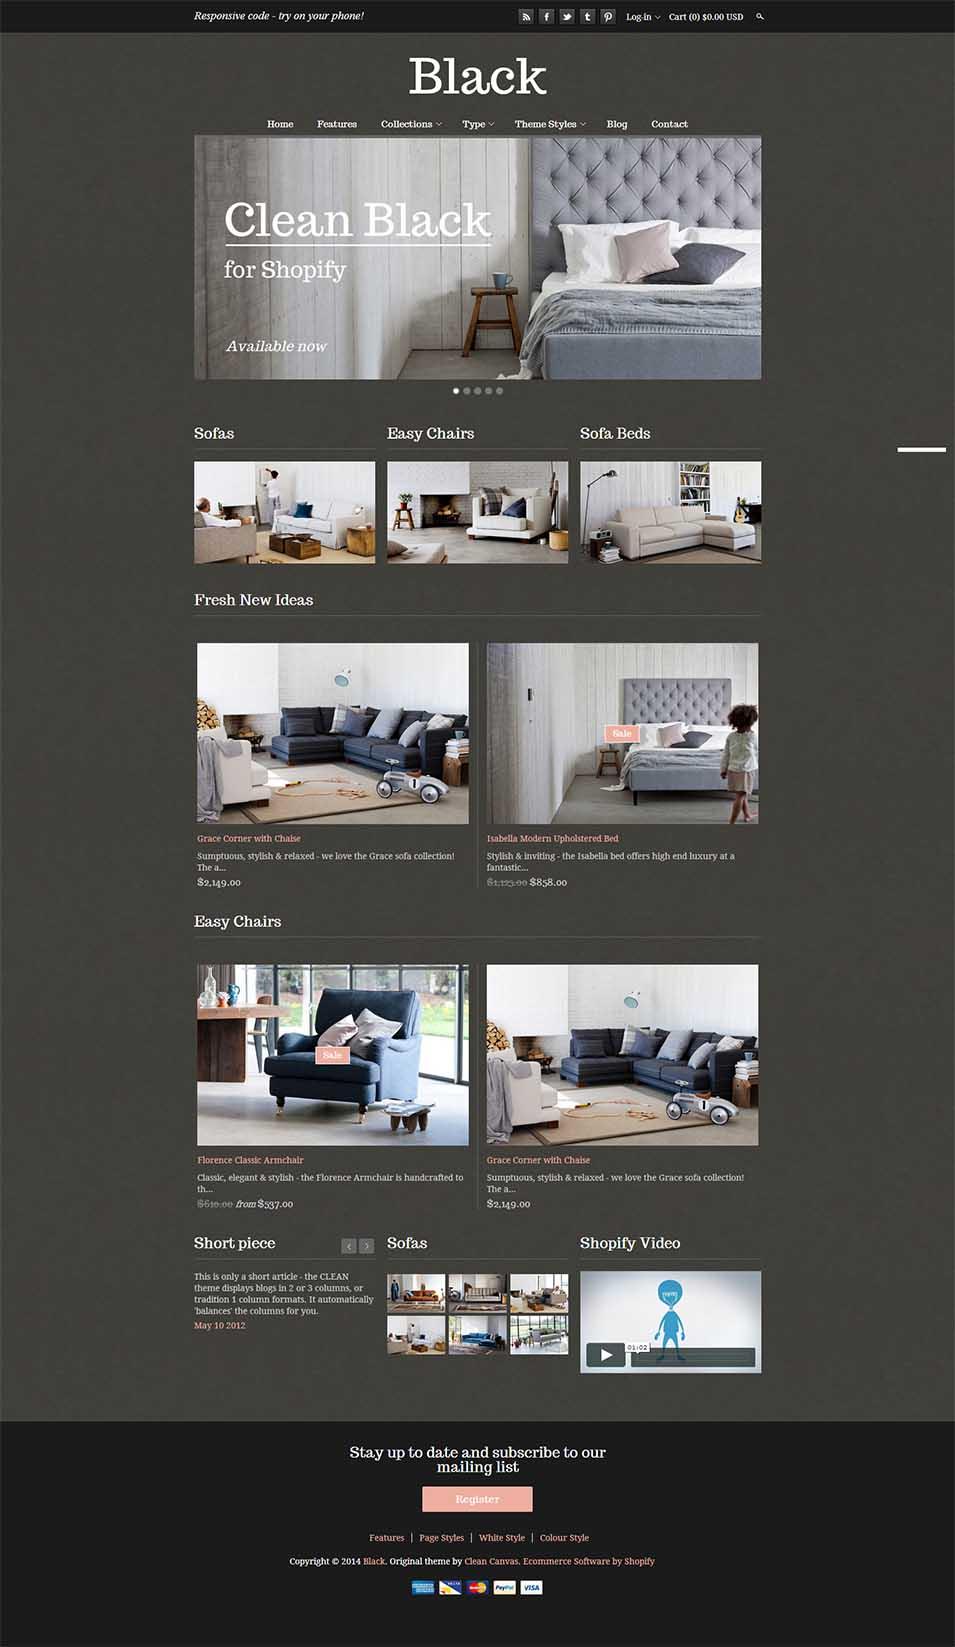 Interior Design Website Template 42812: 34+ Interior Design Website Templates